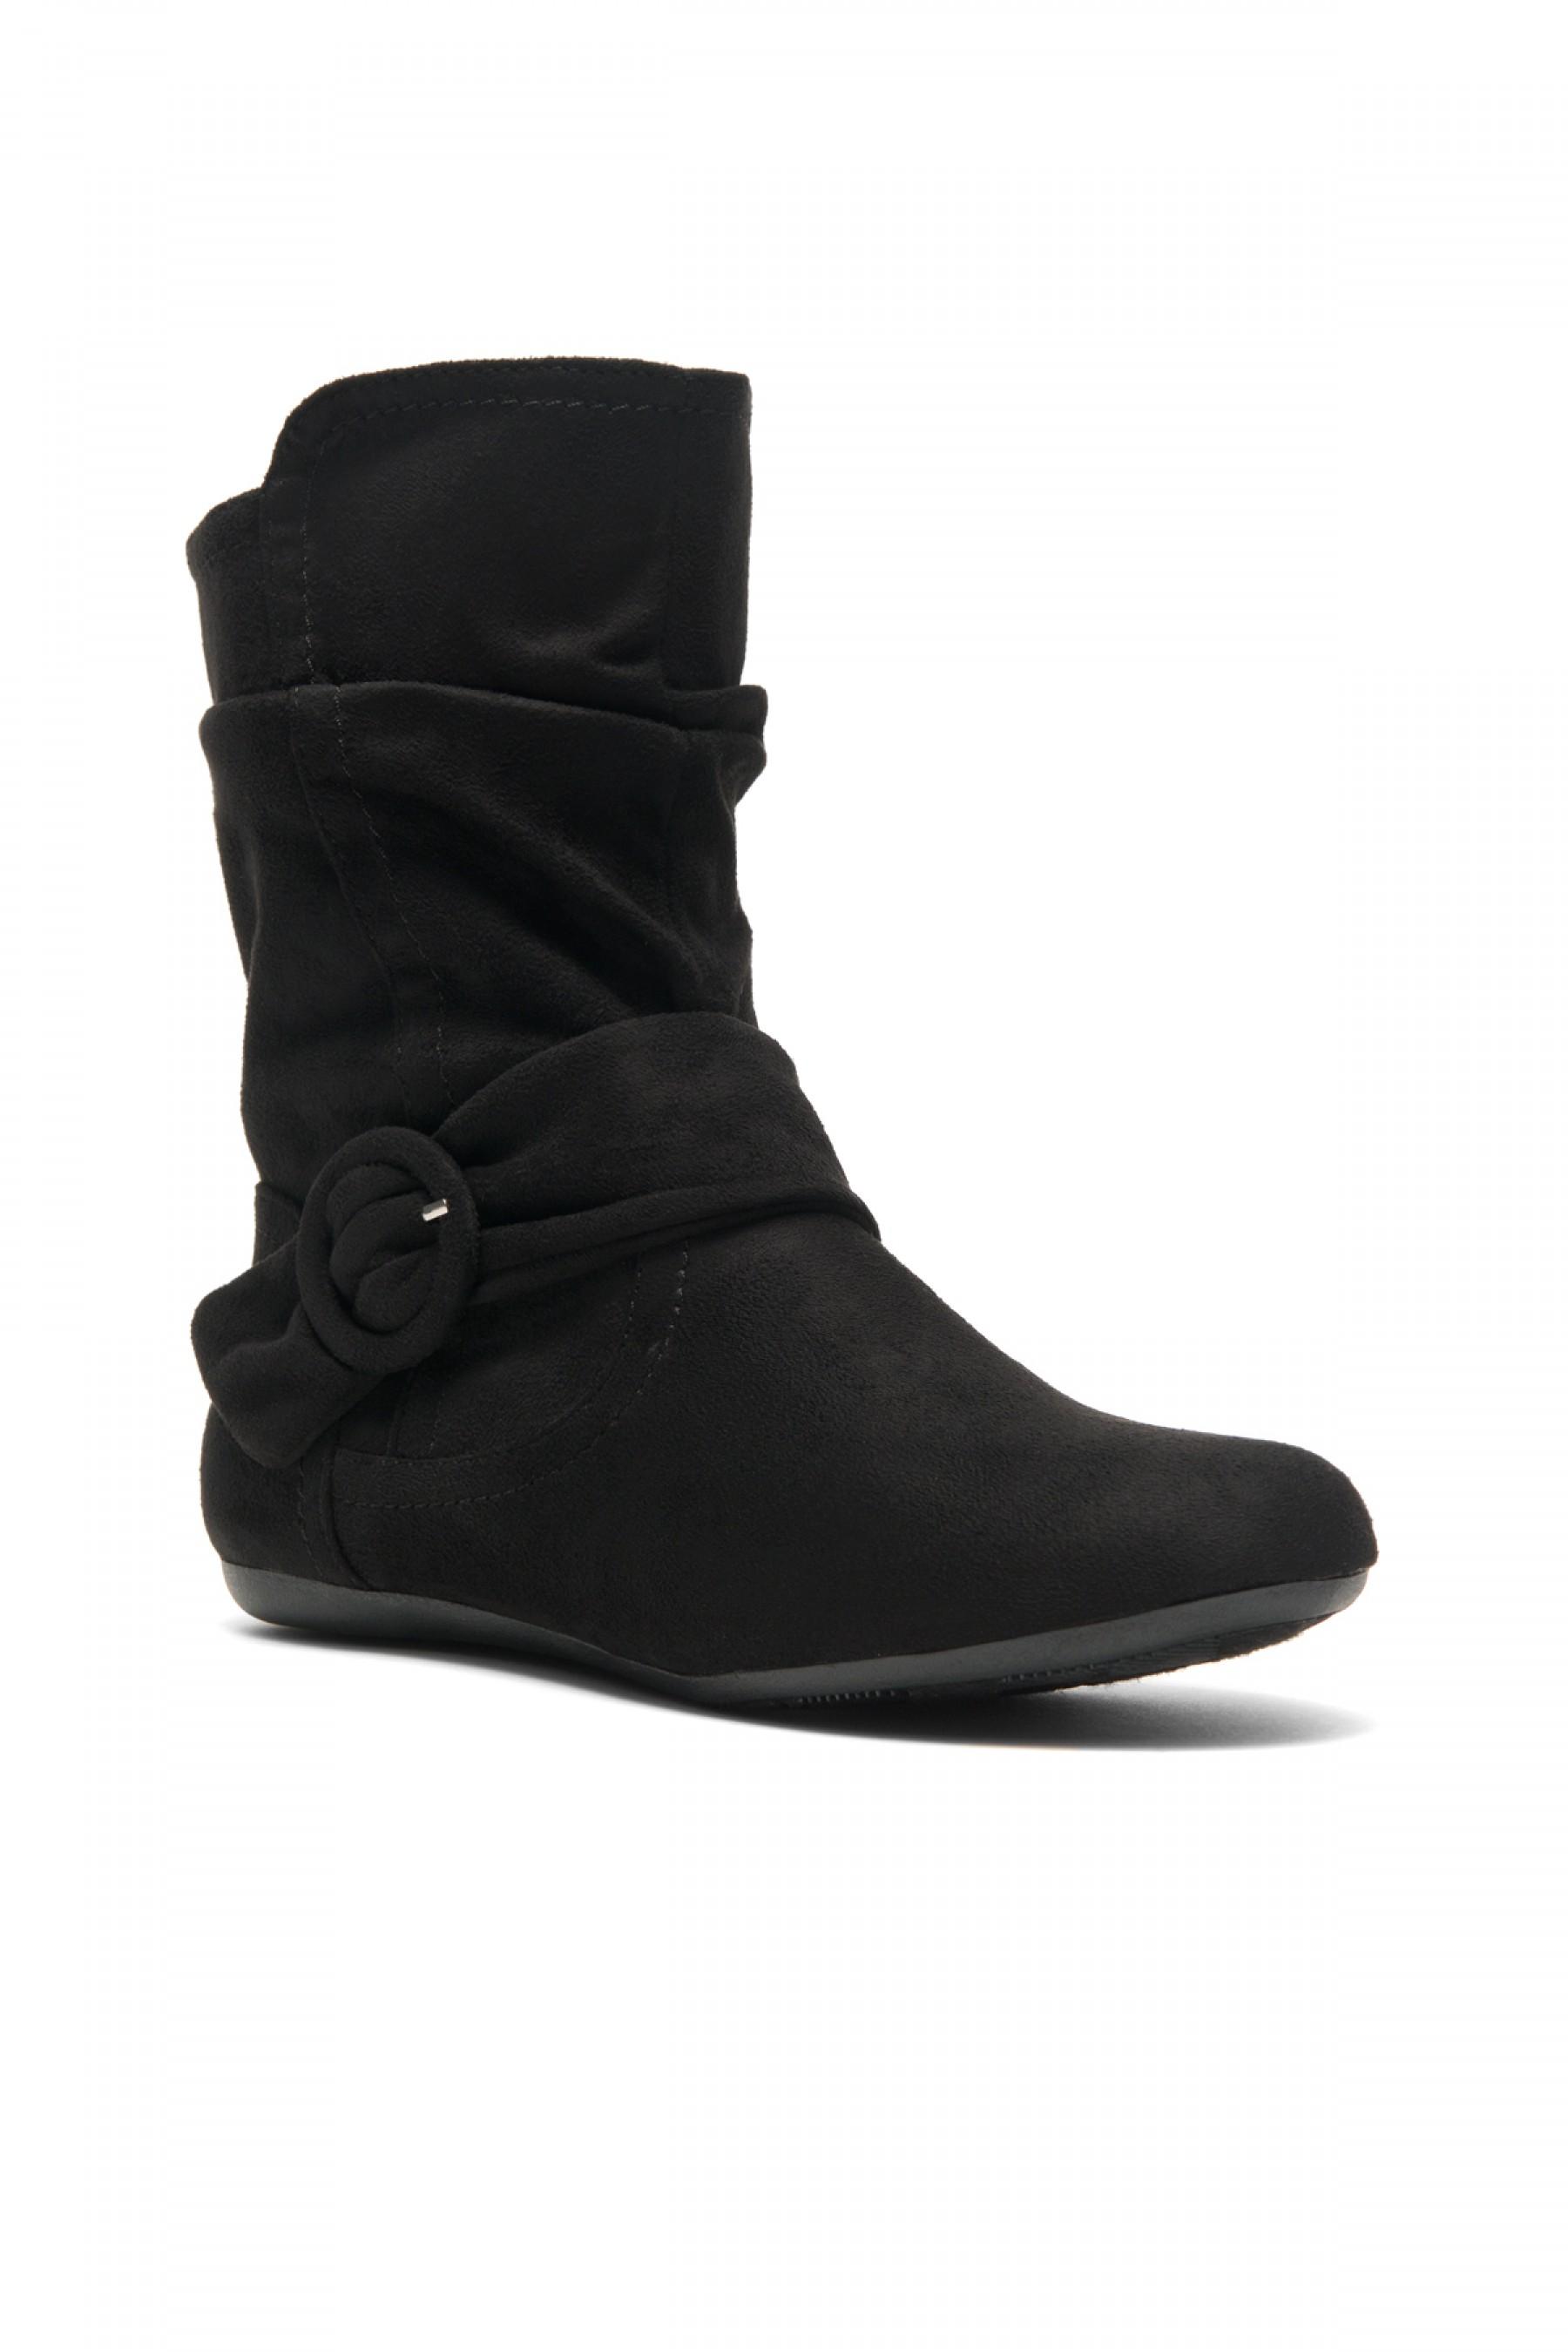 Women's Black Staaton Women's Fashion Calf Flat Heel Side Zipper, Buckled, Slouch Ankle Boots